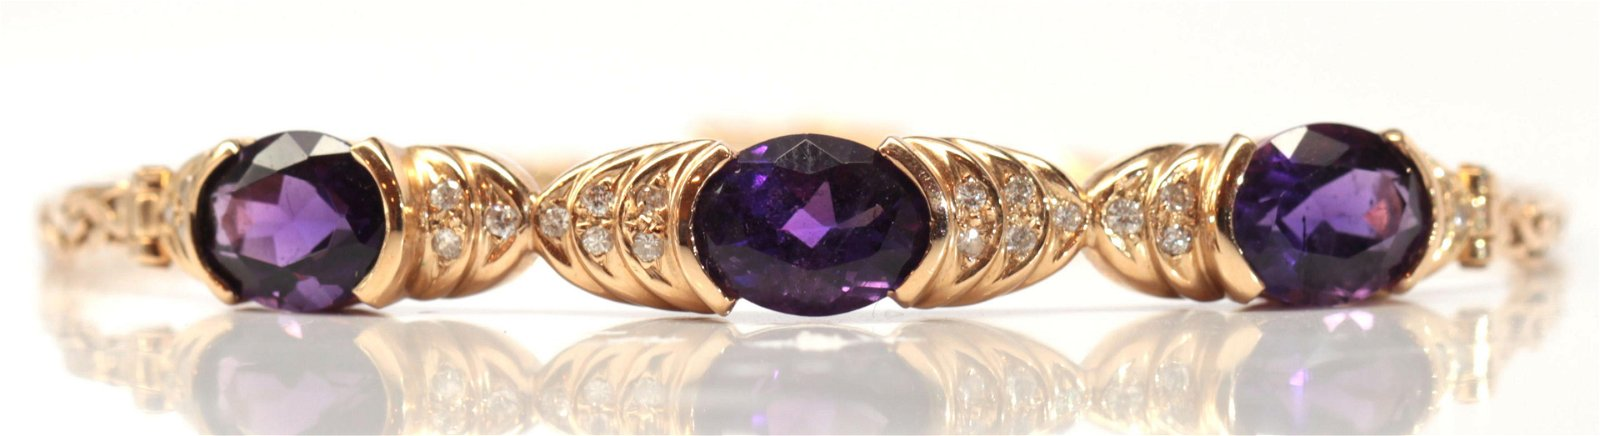 Amethyst, diamond, 14k yellow gold bracelet